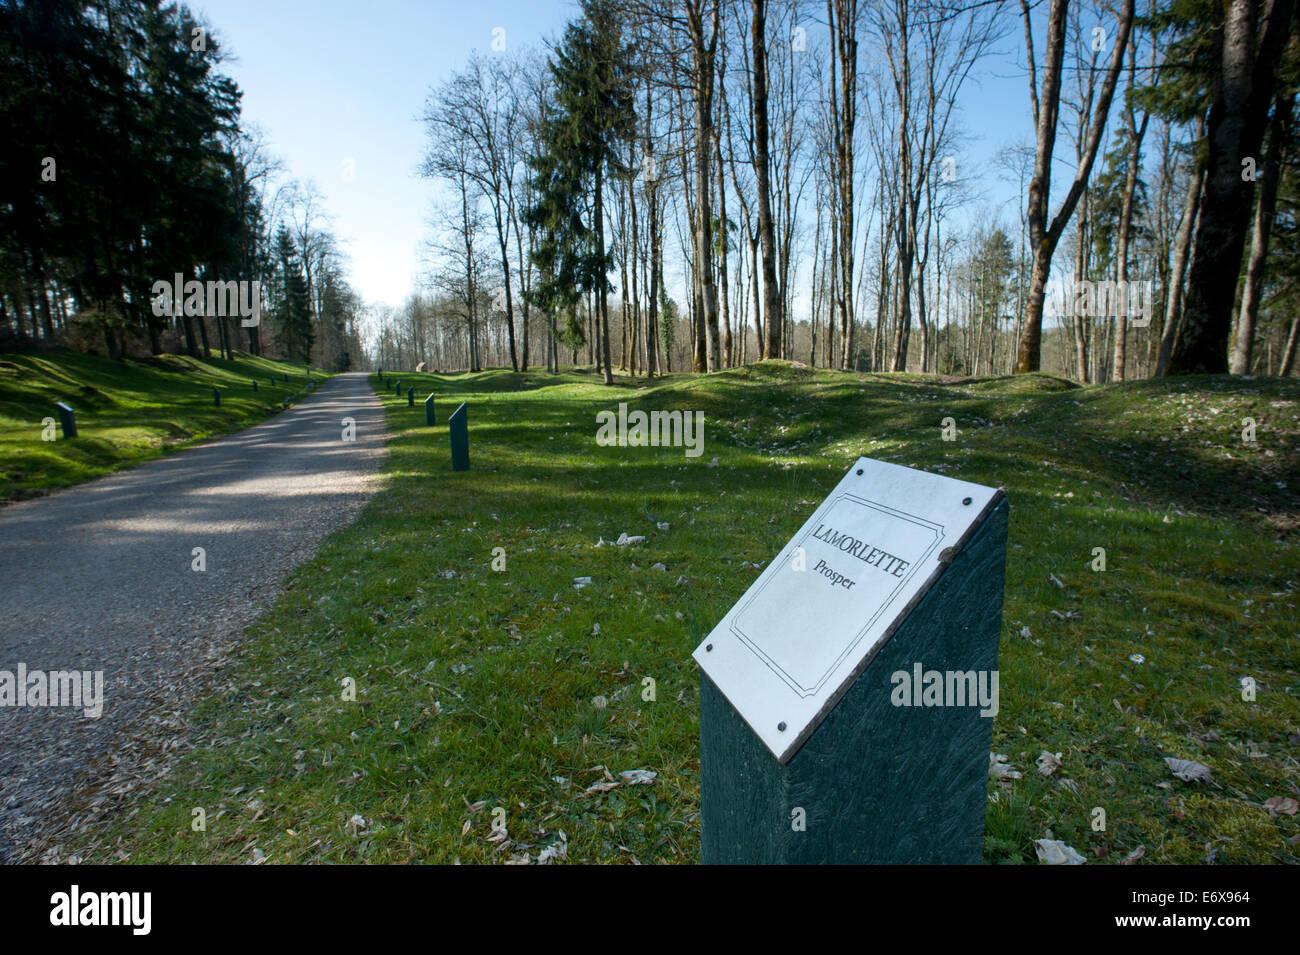 Verdun WW1 Battlefield site, Verdun-sur-Meuse, France. March 2014 Seenhere: During the war, the village of Douaumont Stock Photo